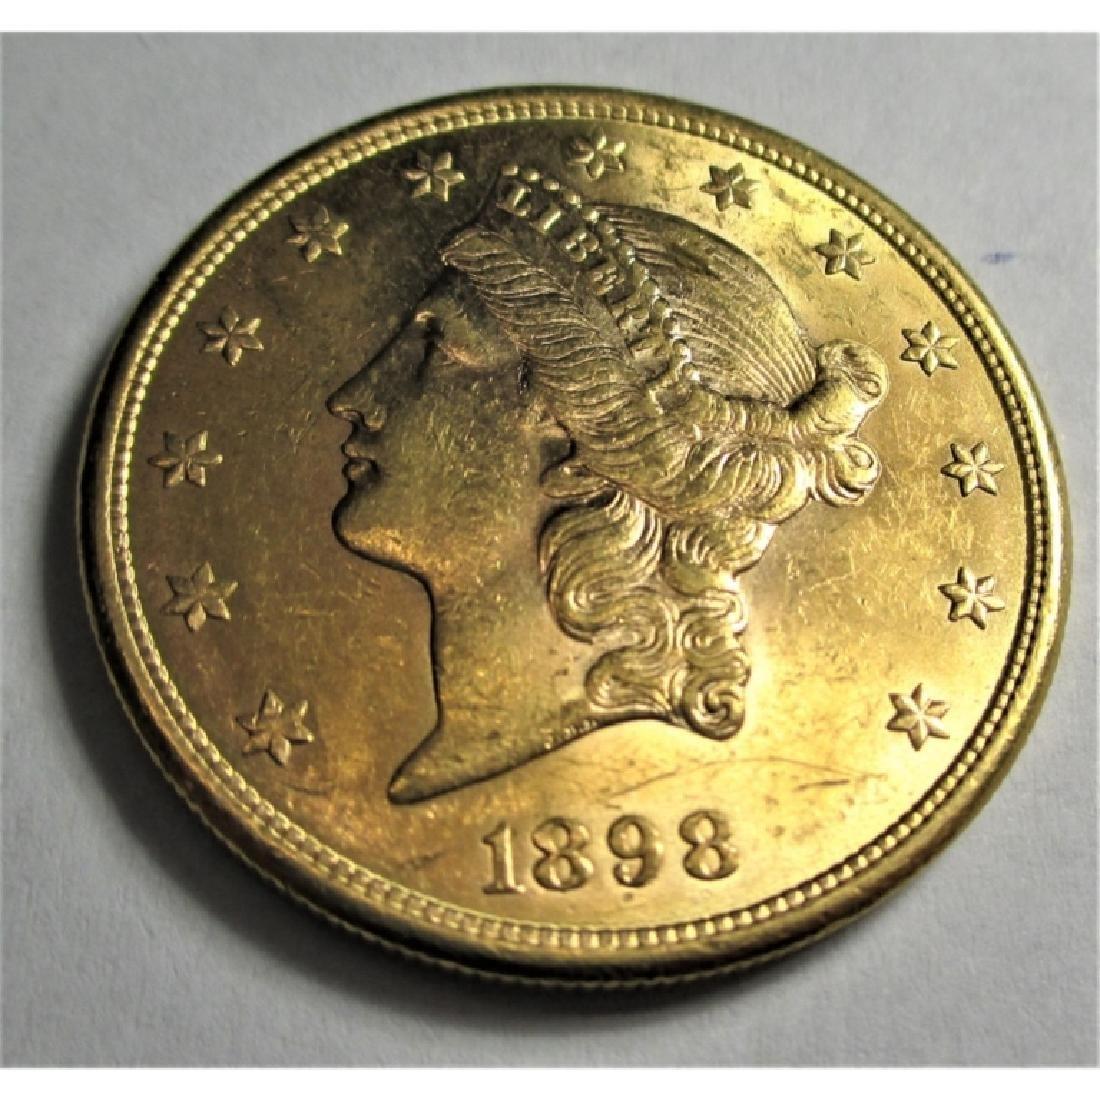 1898 S High Grade $20 Gold Liberty Double Eagle